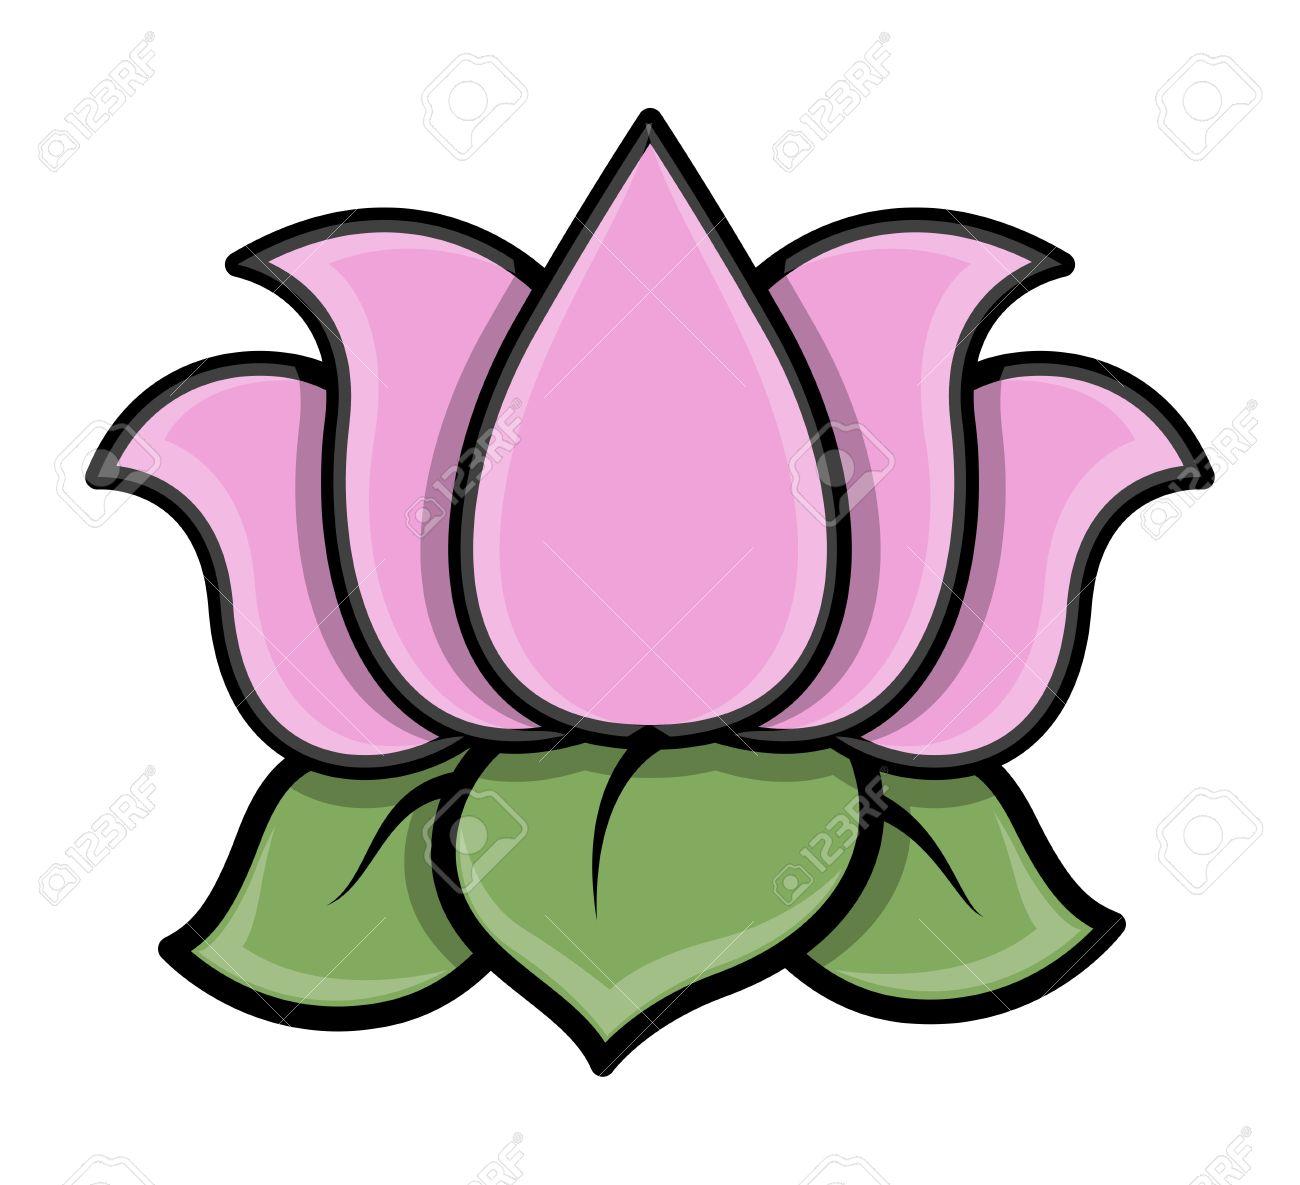 Lotus Flower Cartoon Vector Illustration Royalty Free Cliparts